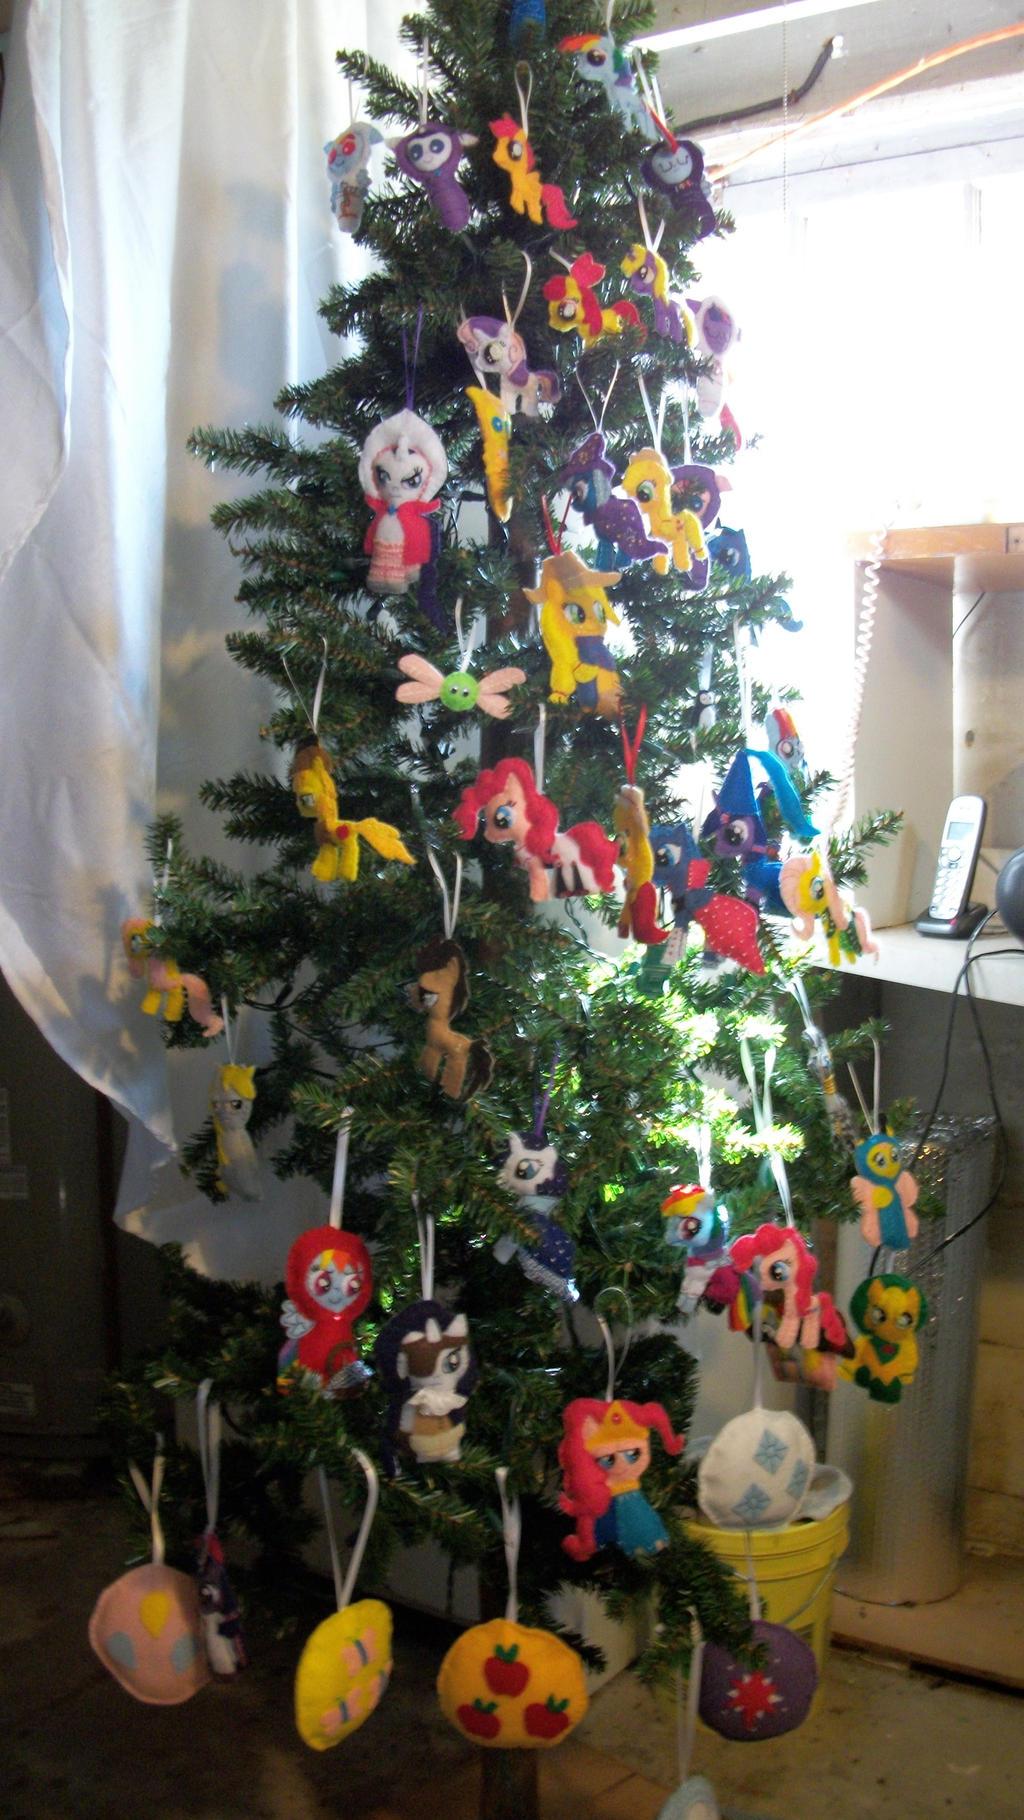 MLP-FIM PONY ORNAMENT TREE by grandmoonma